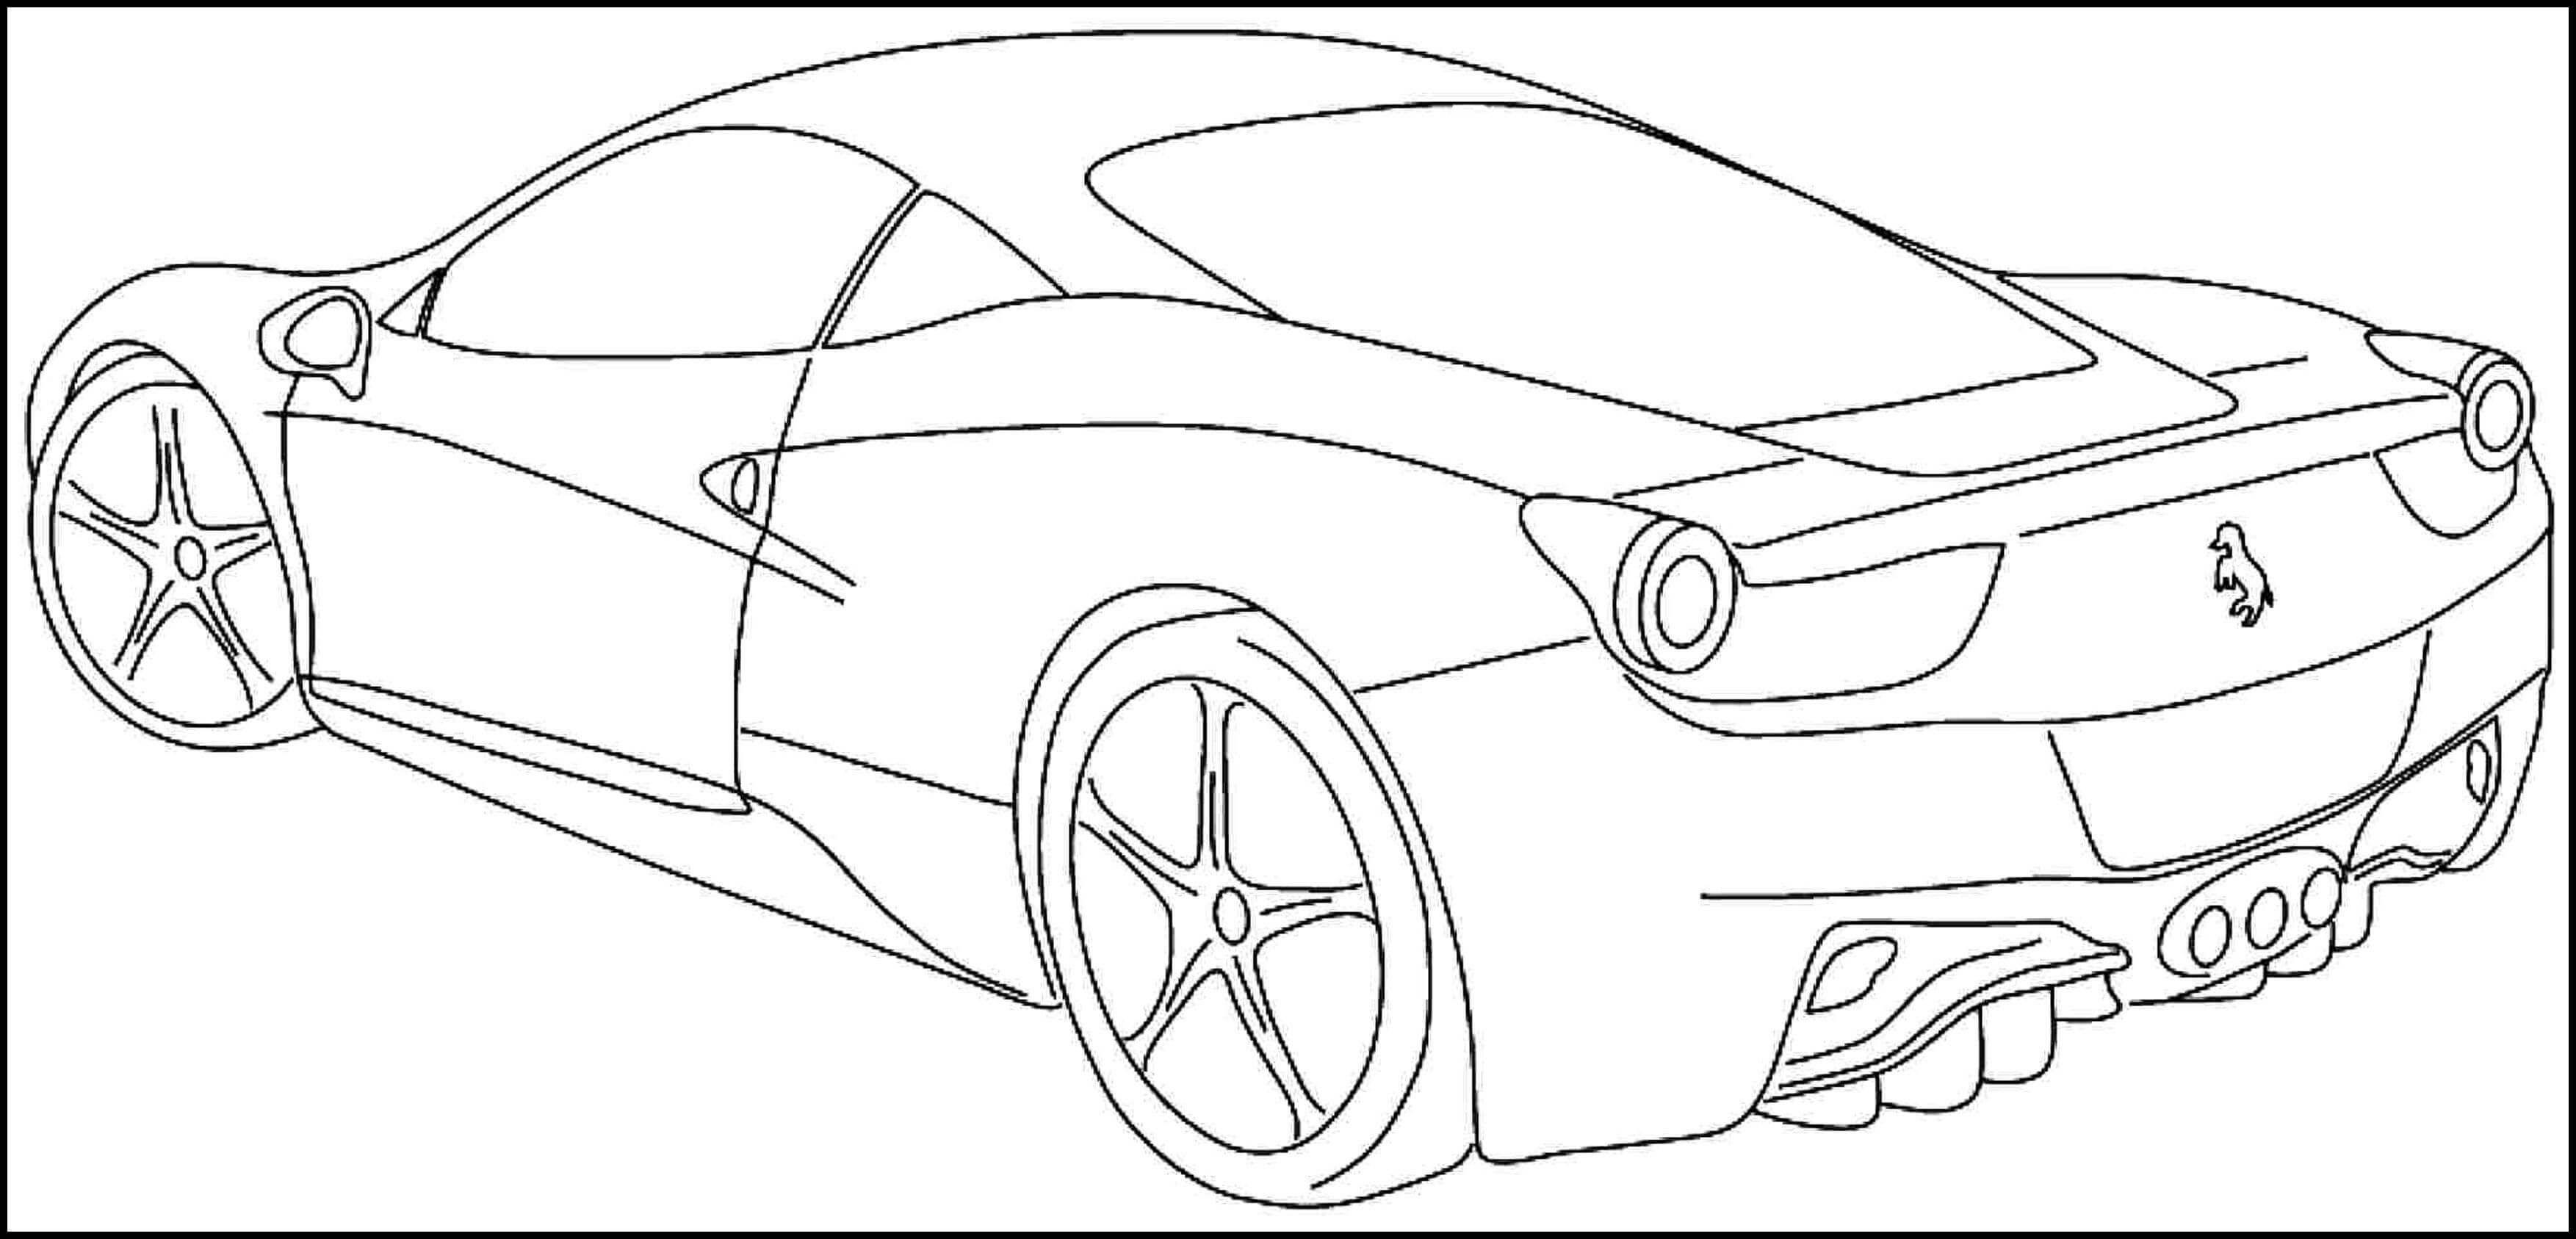 Xenon Strobe Light 110v By Scrcircuit Diagram World